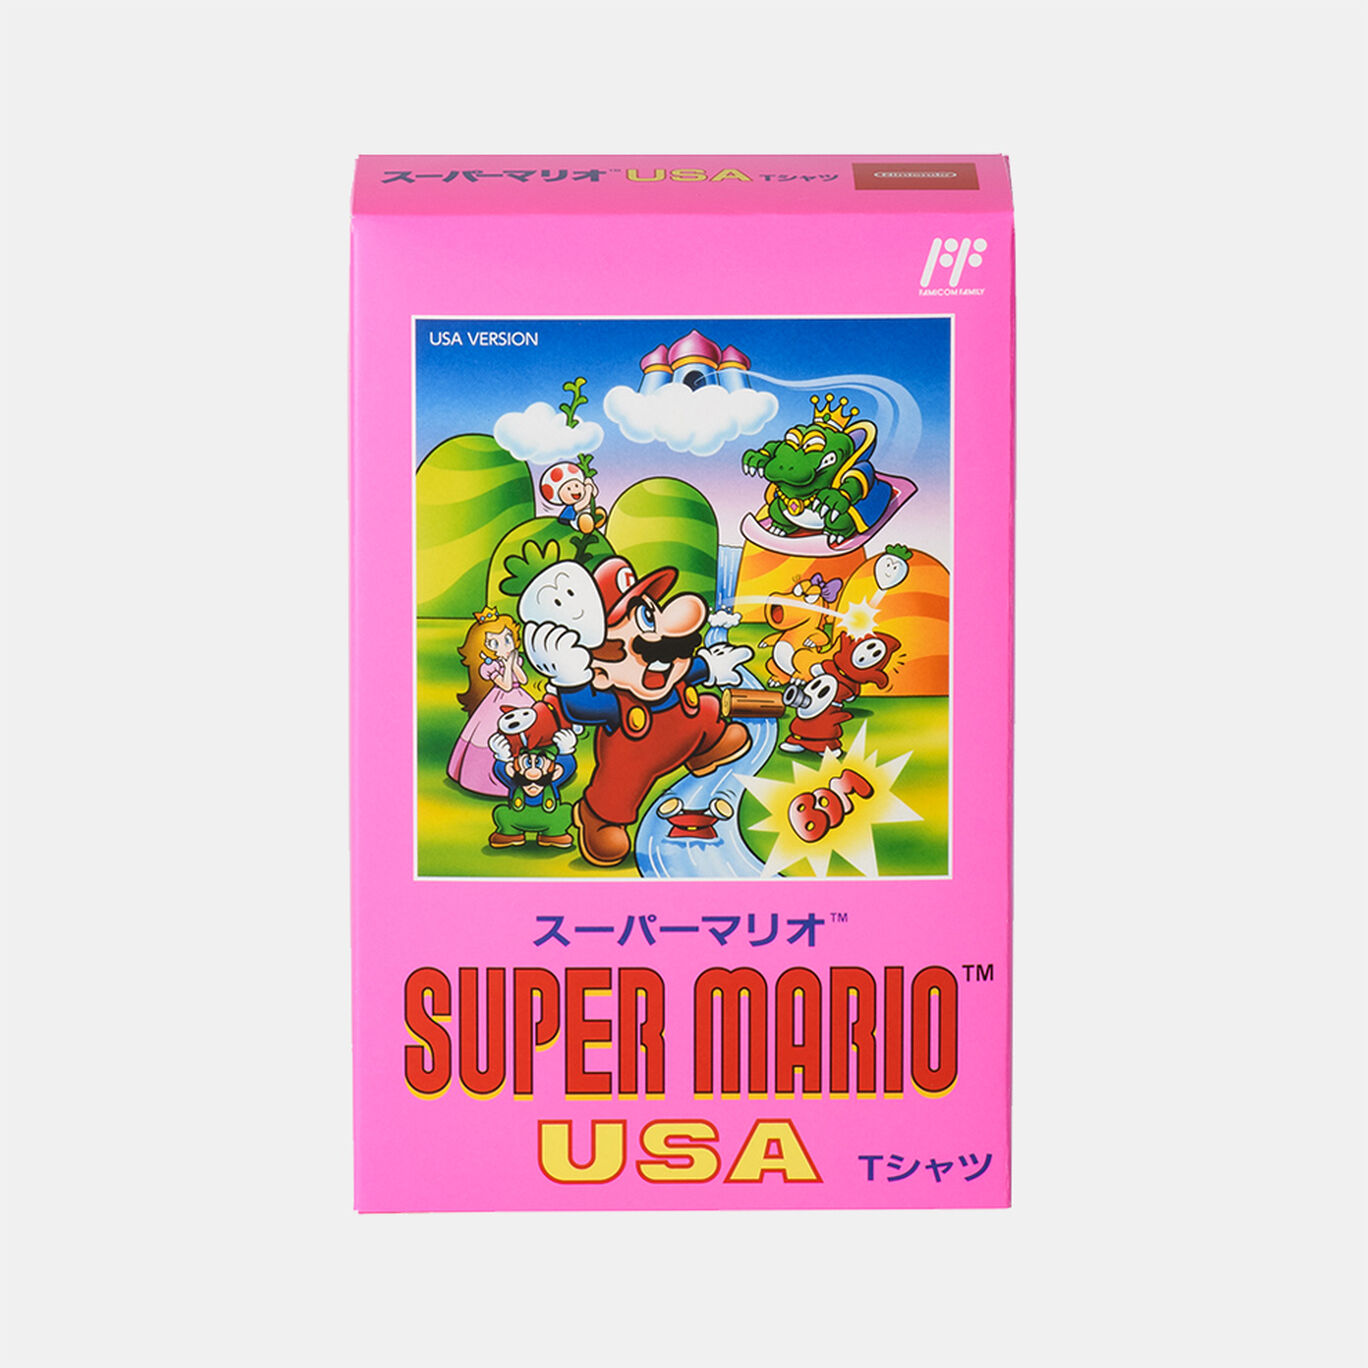 Tシャツ スーパーマリオUSA S【Nintendo TOKYO取り扱い商品】